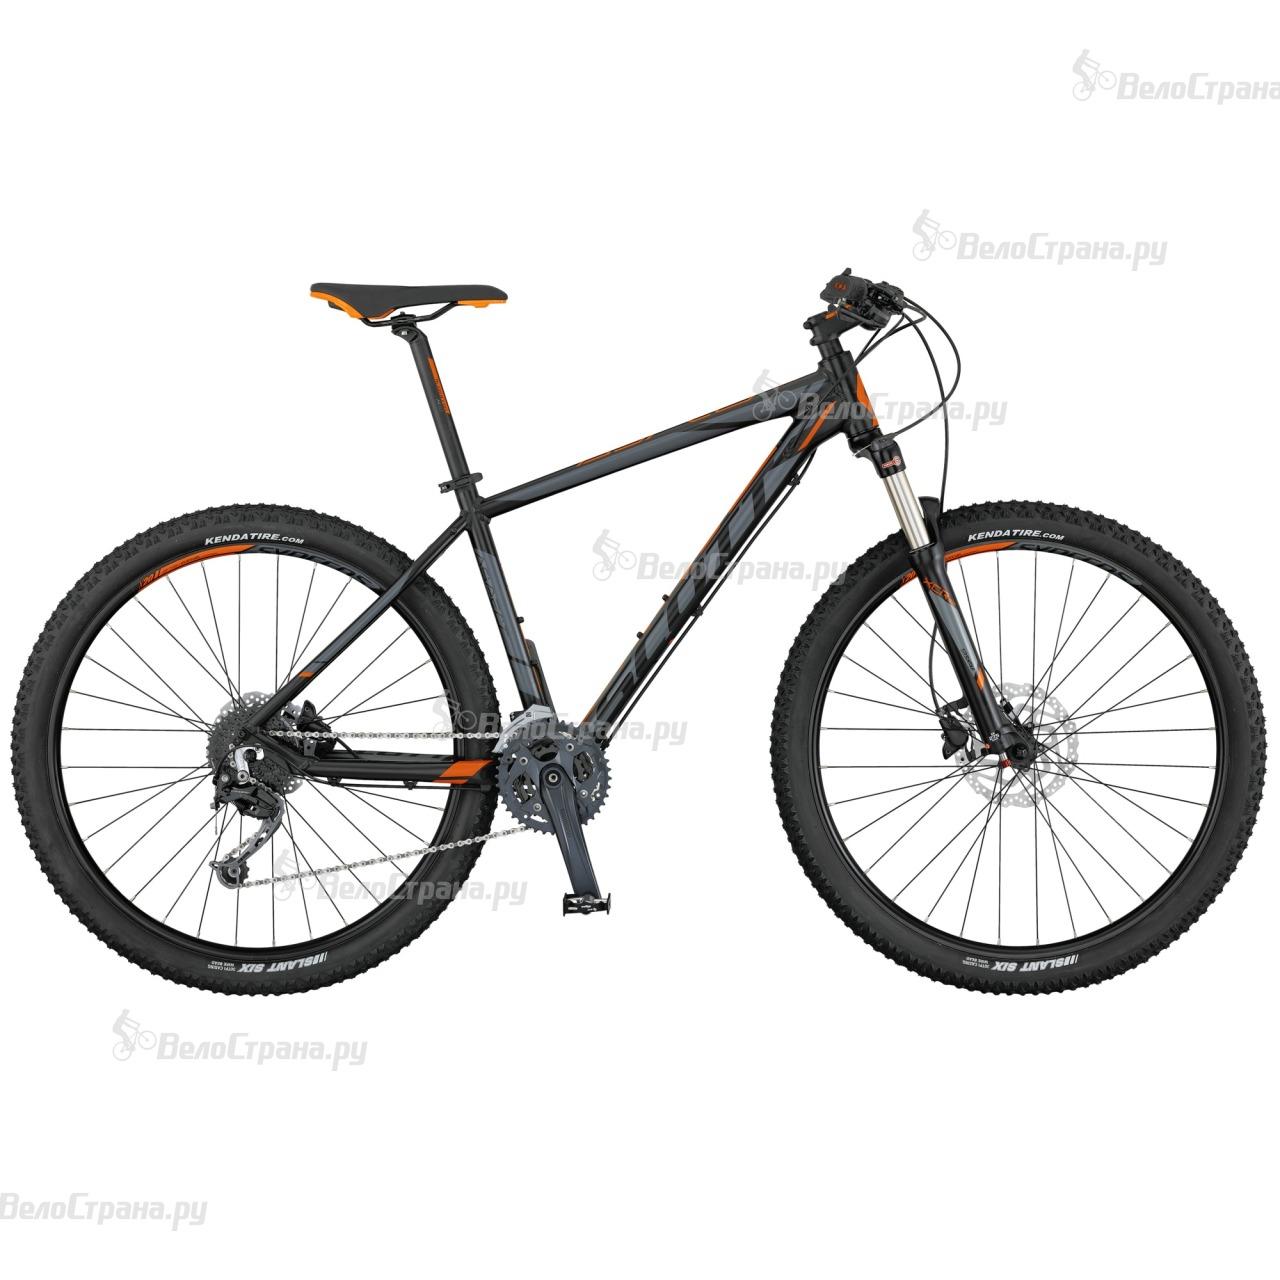 Велосипед Scott Aspect 930 (2017) велосипед scott aspect 930 29 2016